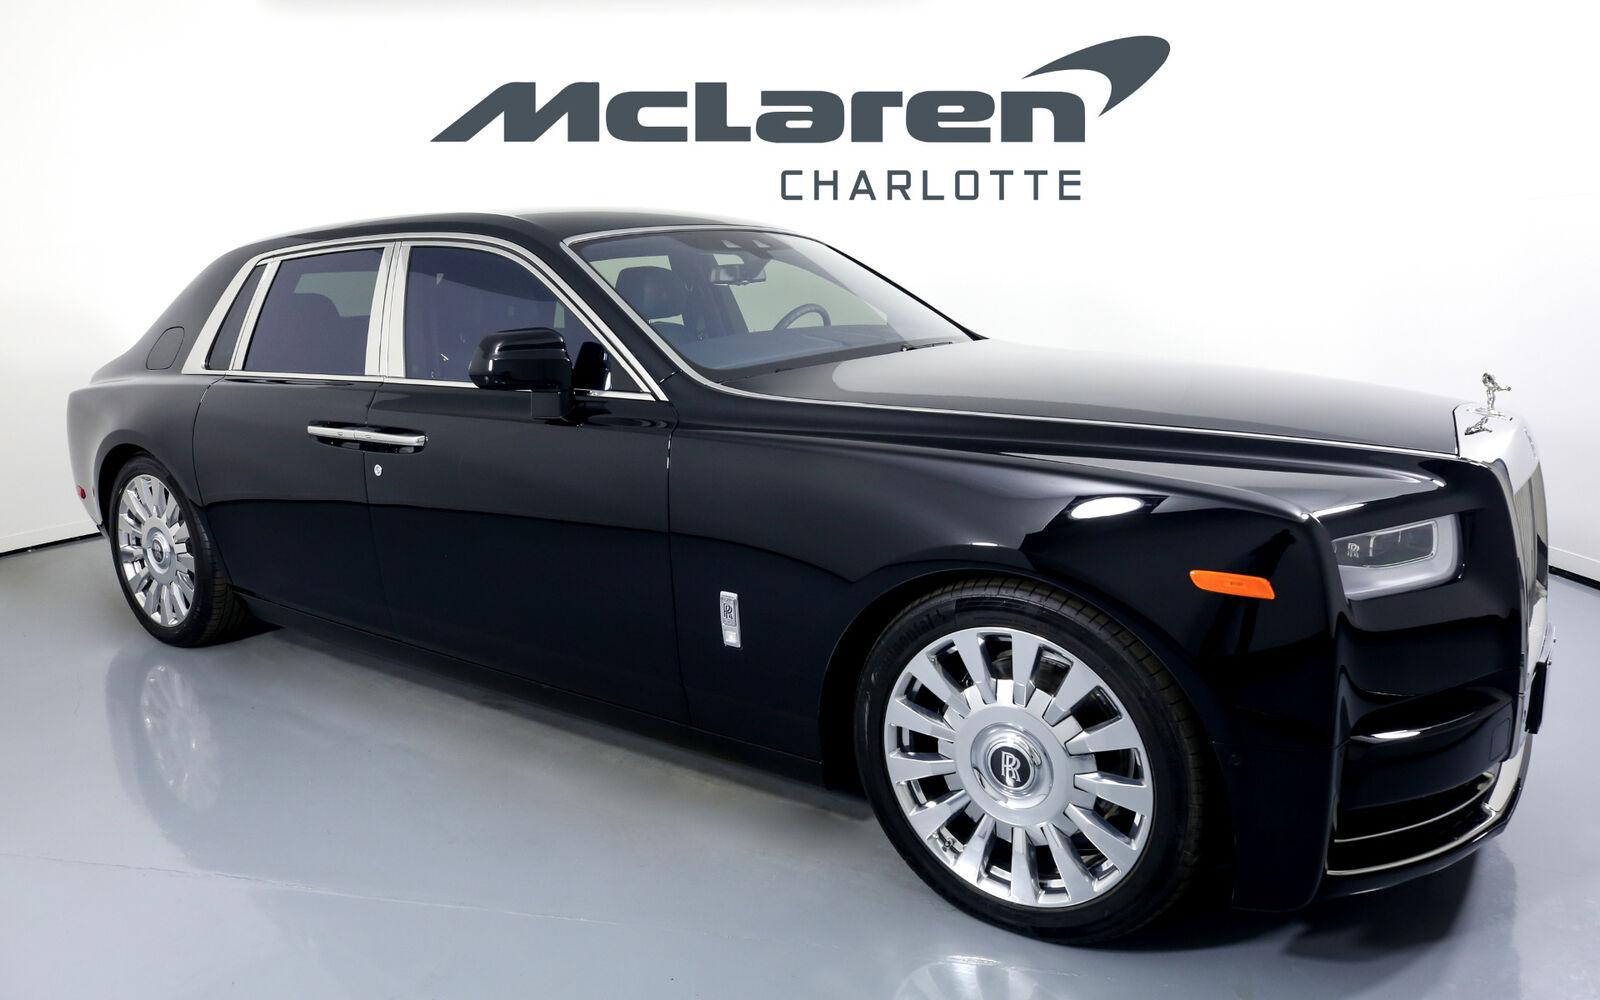 2019 Rolls-Royce Phantom  (Used - 493496 USD)